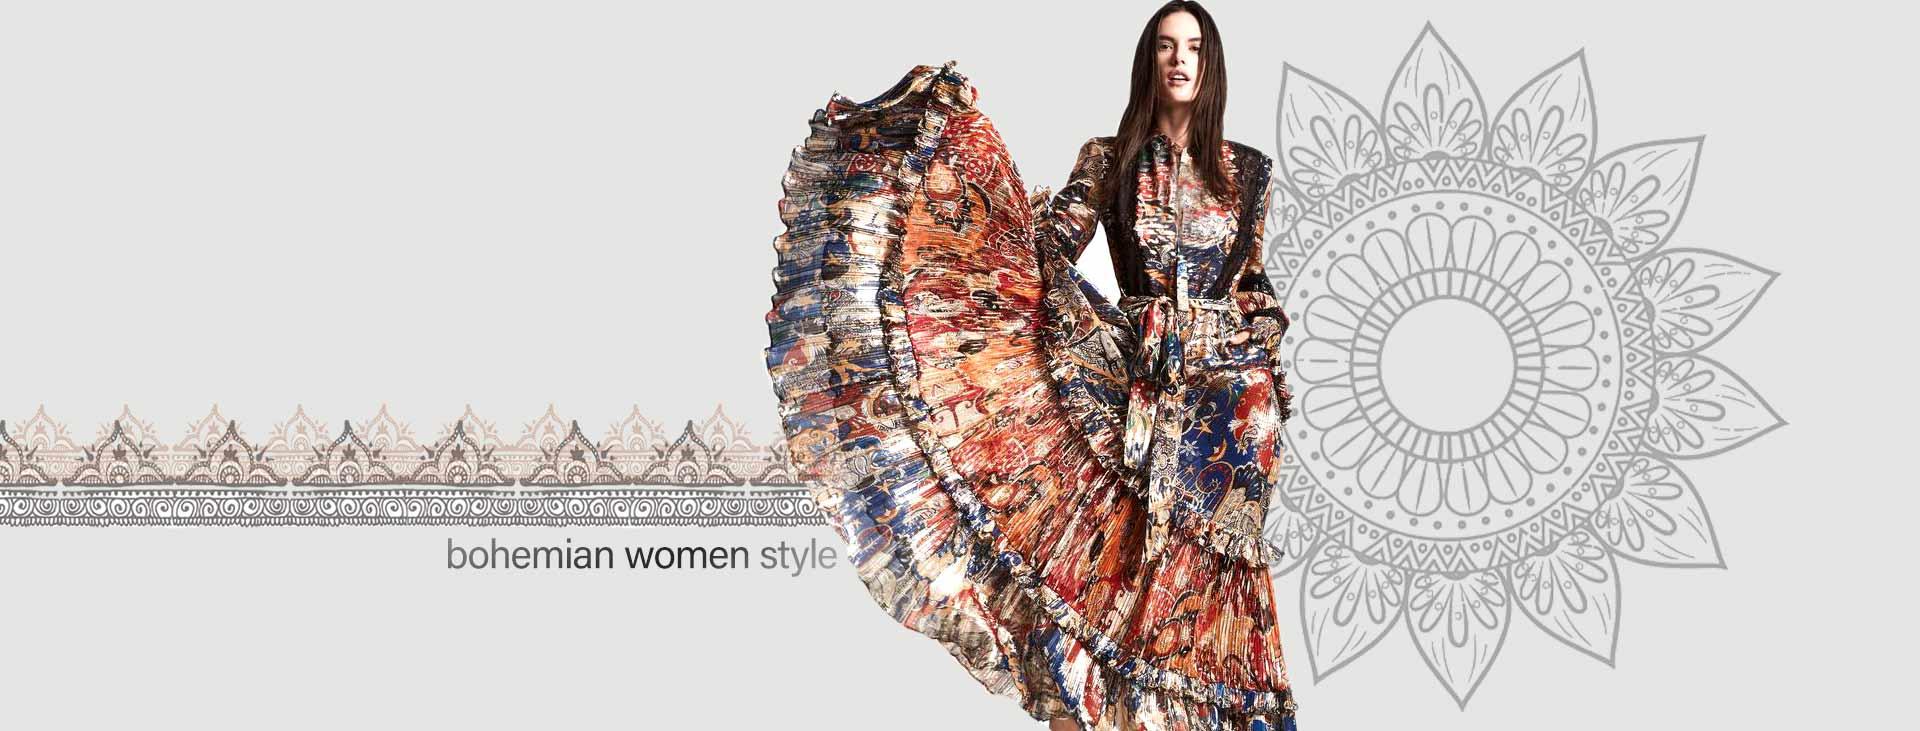 bohemian women style 2 - استایل بوهو زنانه